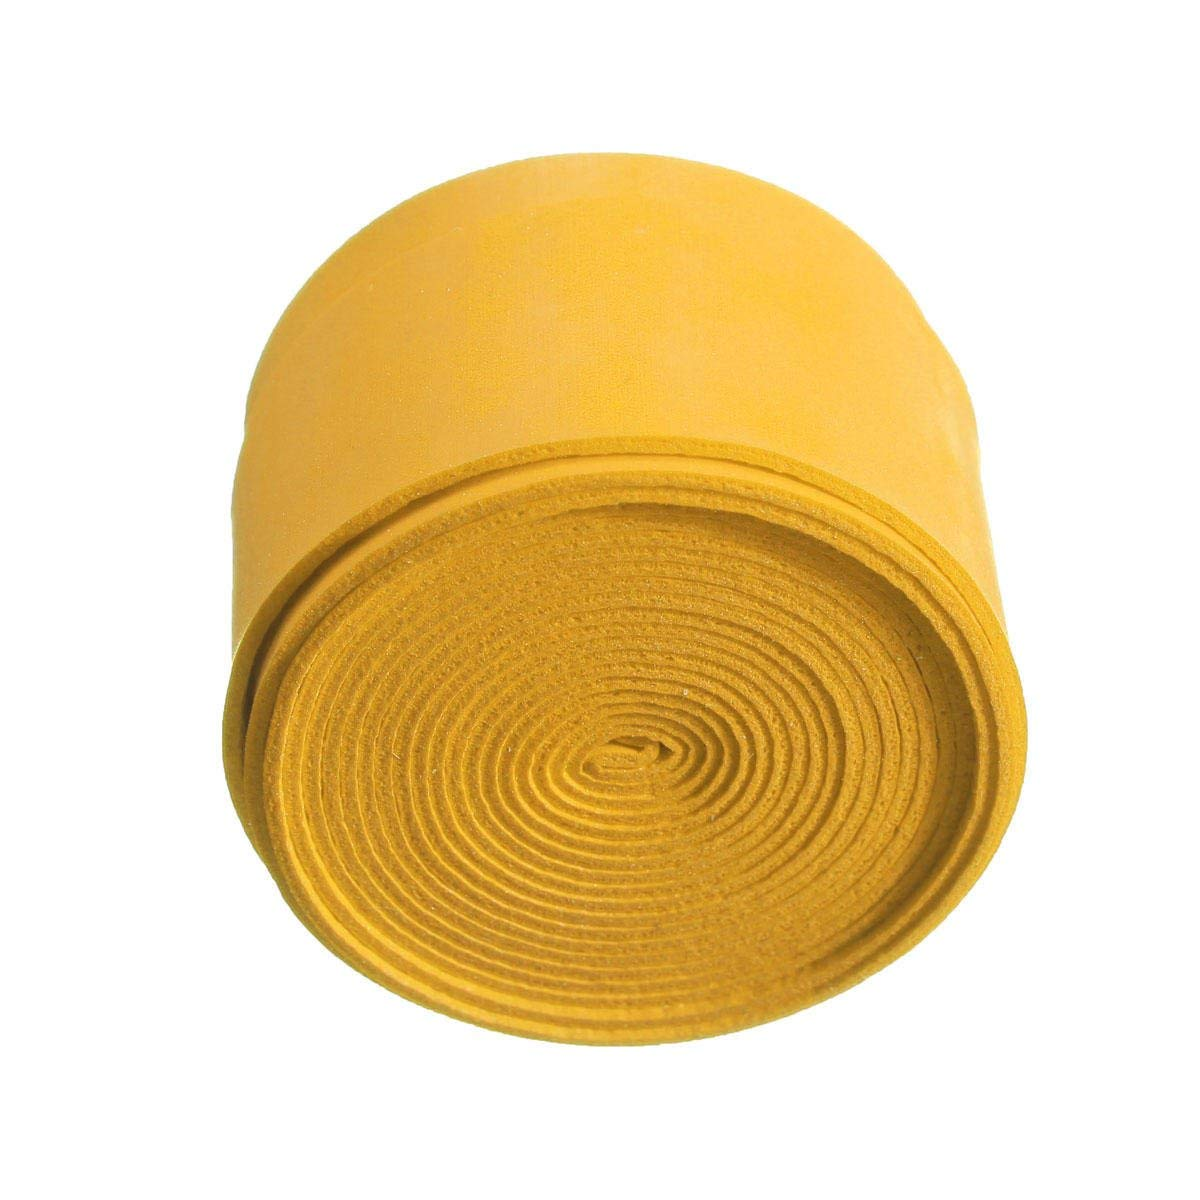 25×1100×0.75mm Anti Slip Tennis Racket Grip Tapes Badminton Racket Squash Tape - Tapes, Adhesives & Sealants Adhesive Tapes - (Yellow) - 2 X Badminton/Tennis Grip